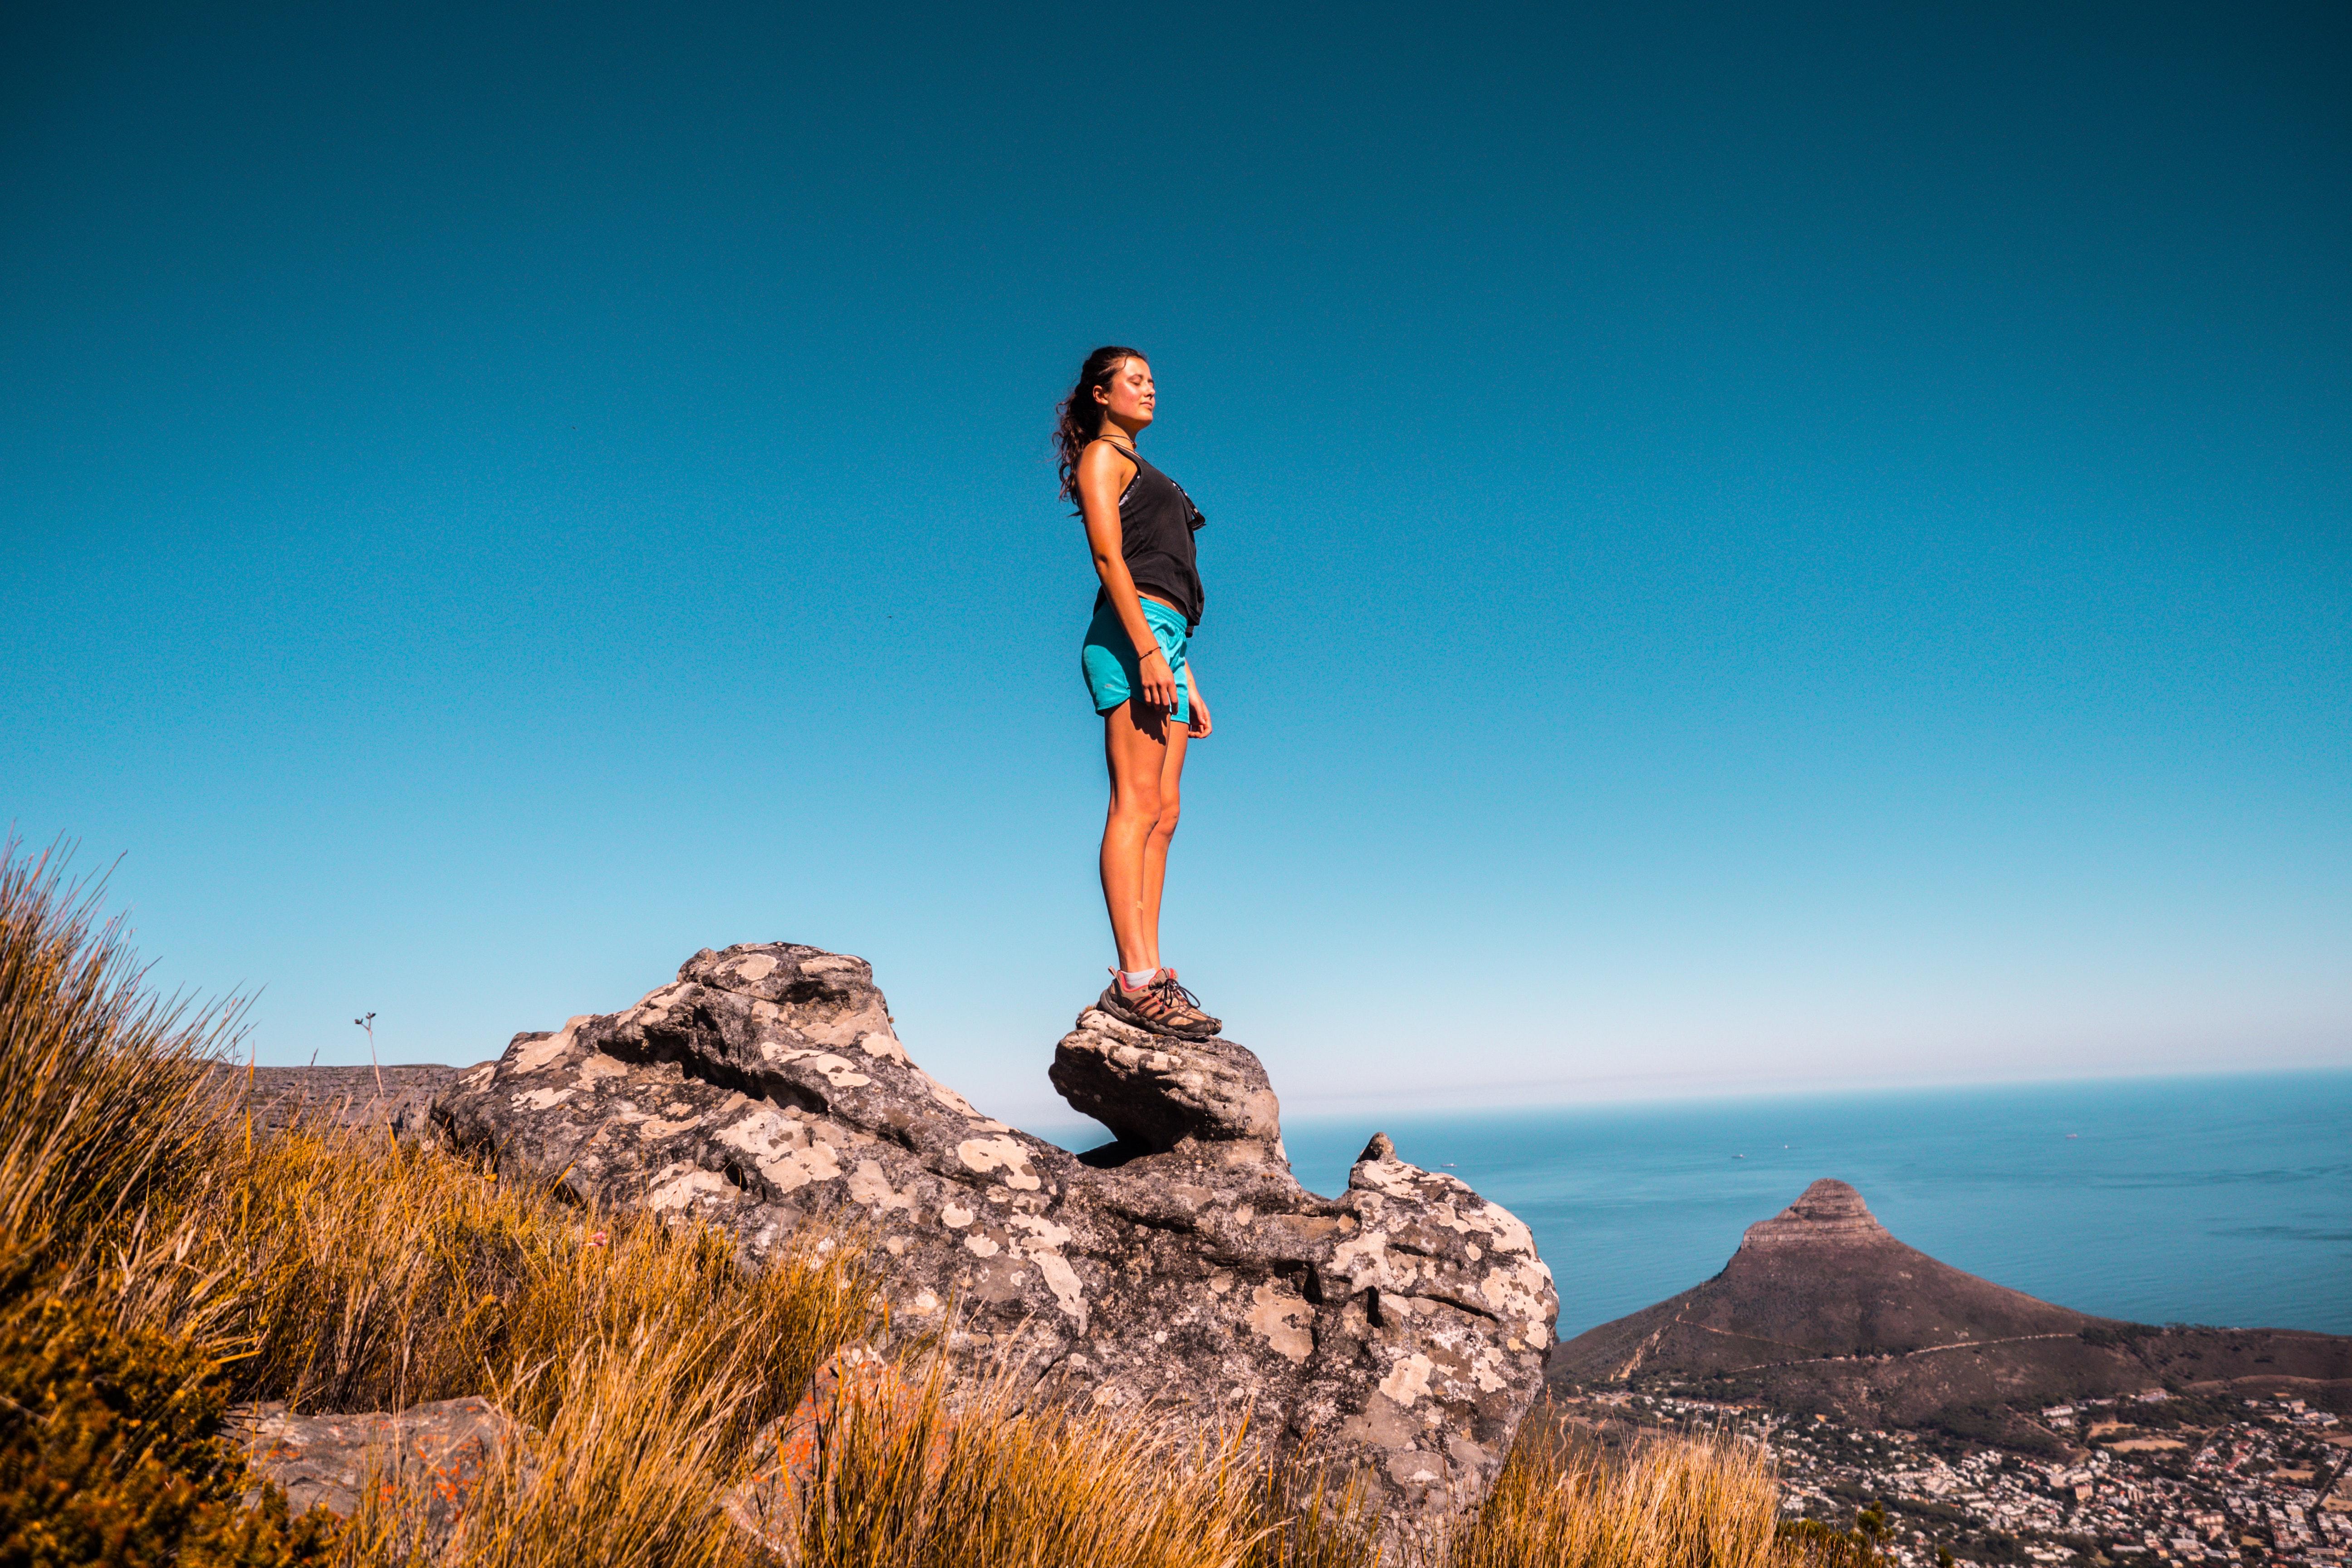 5 travel hacks for hiking | Travel Guide | Elle Blonde Luxury Lifestyle Destination Blog